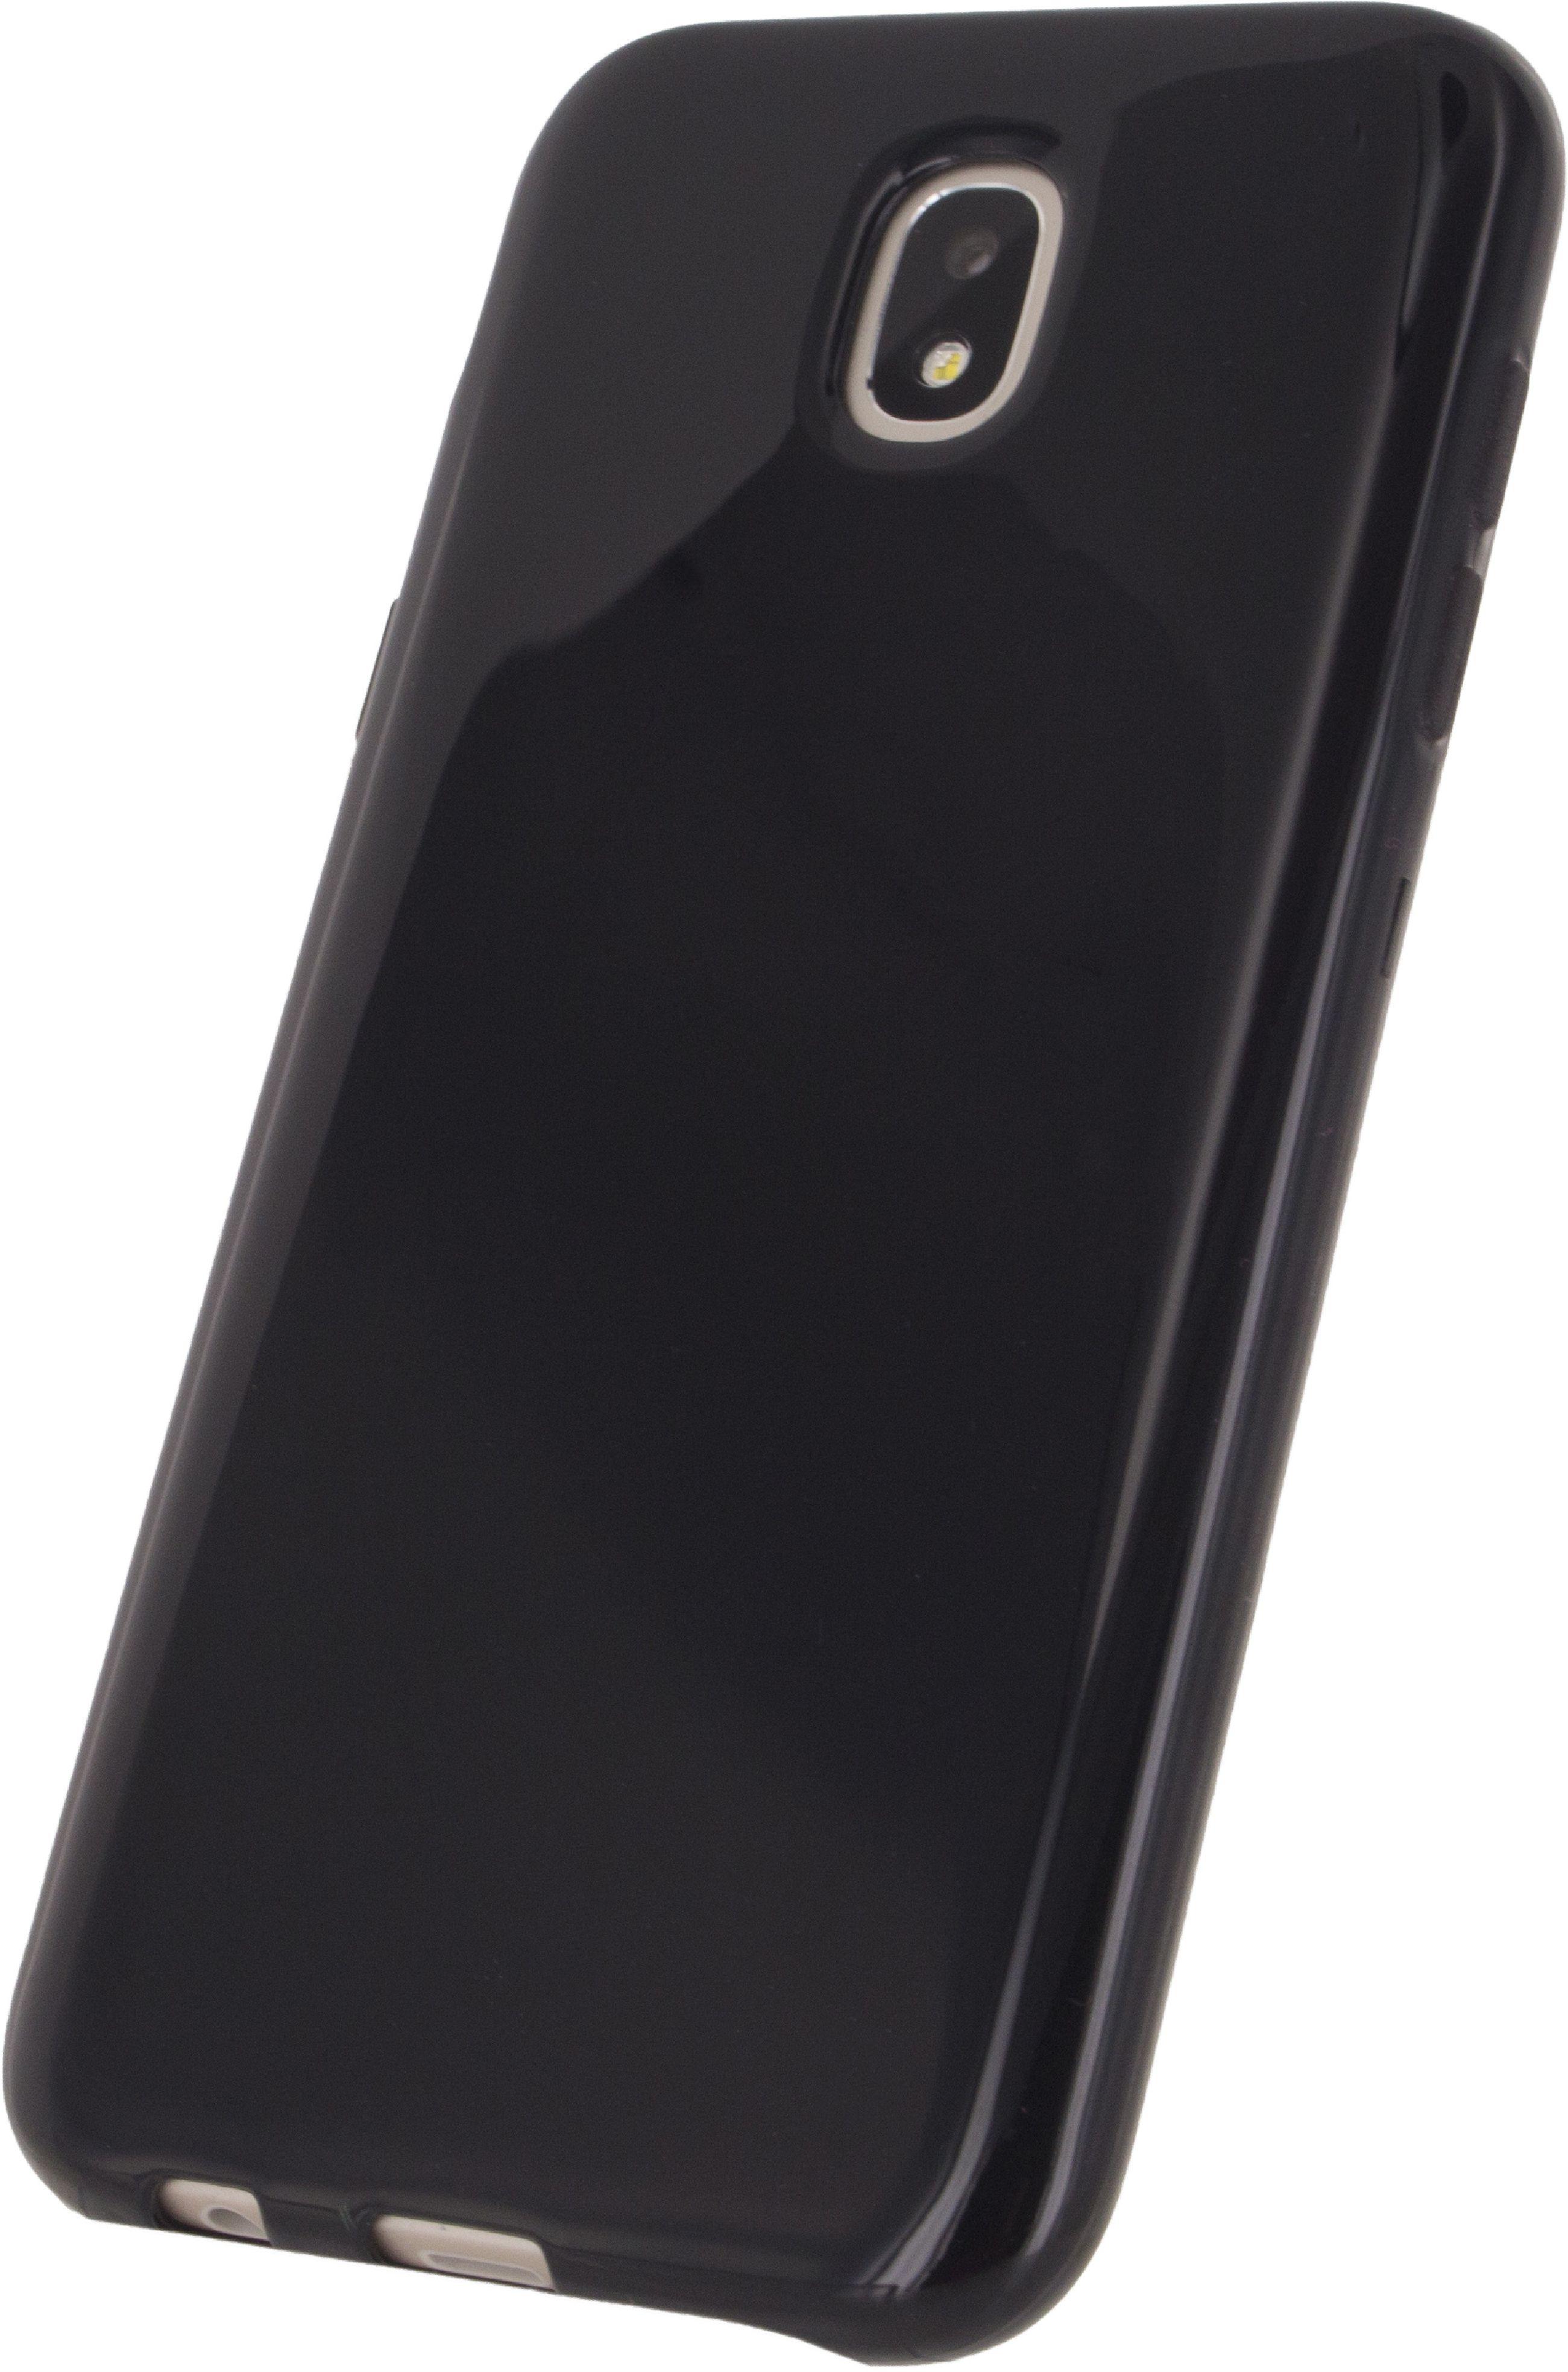 Image of   Telefon Gel-Etui Samsung Galaxy J7 2017 Sort